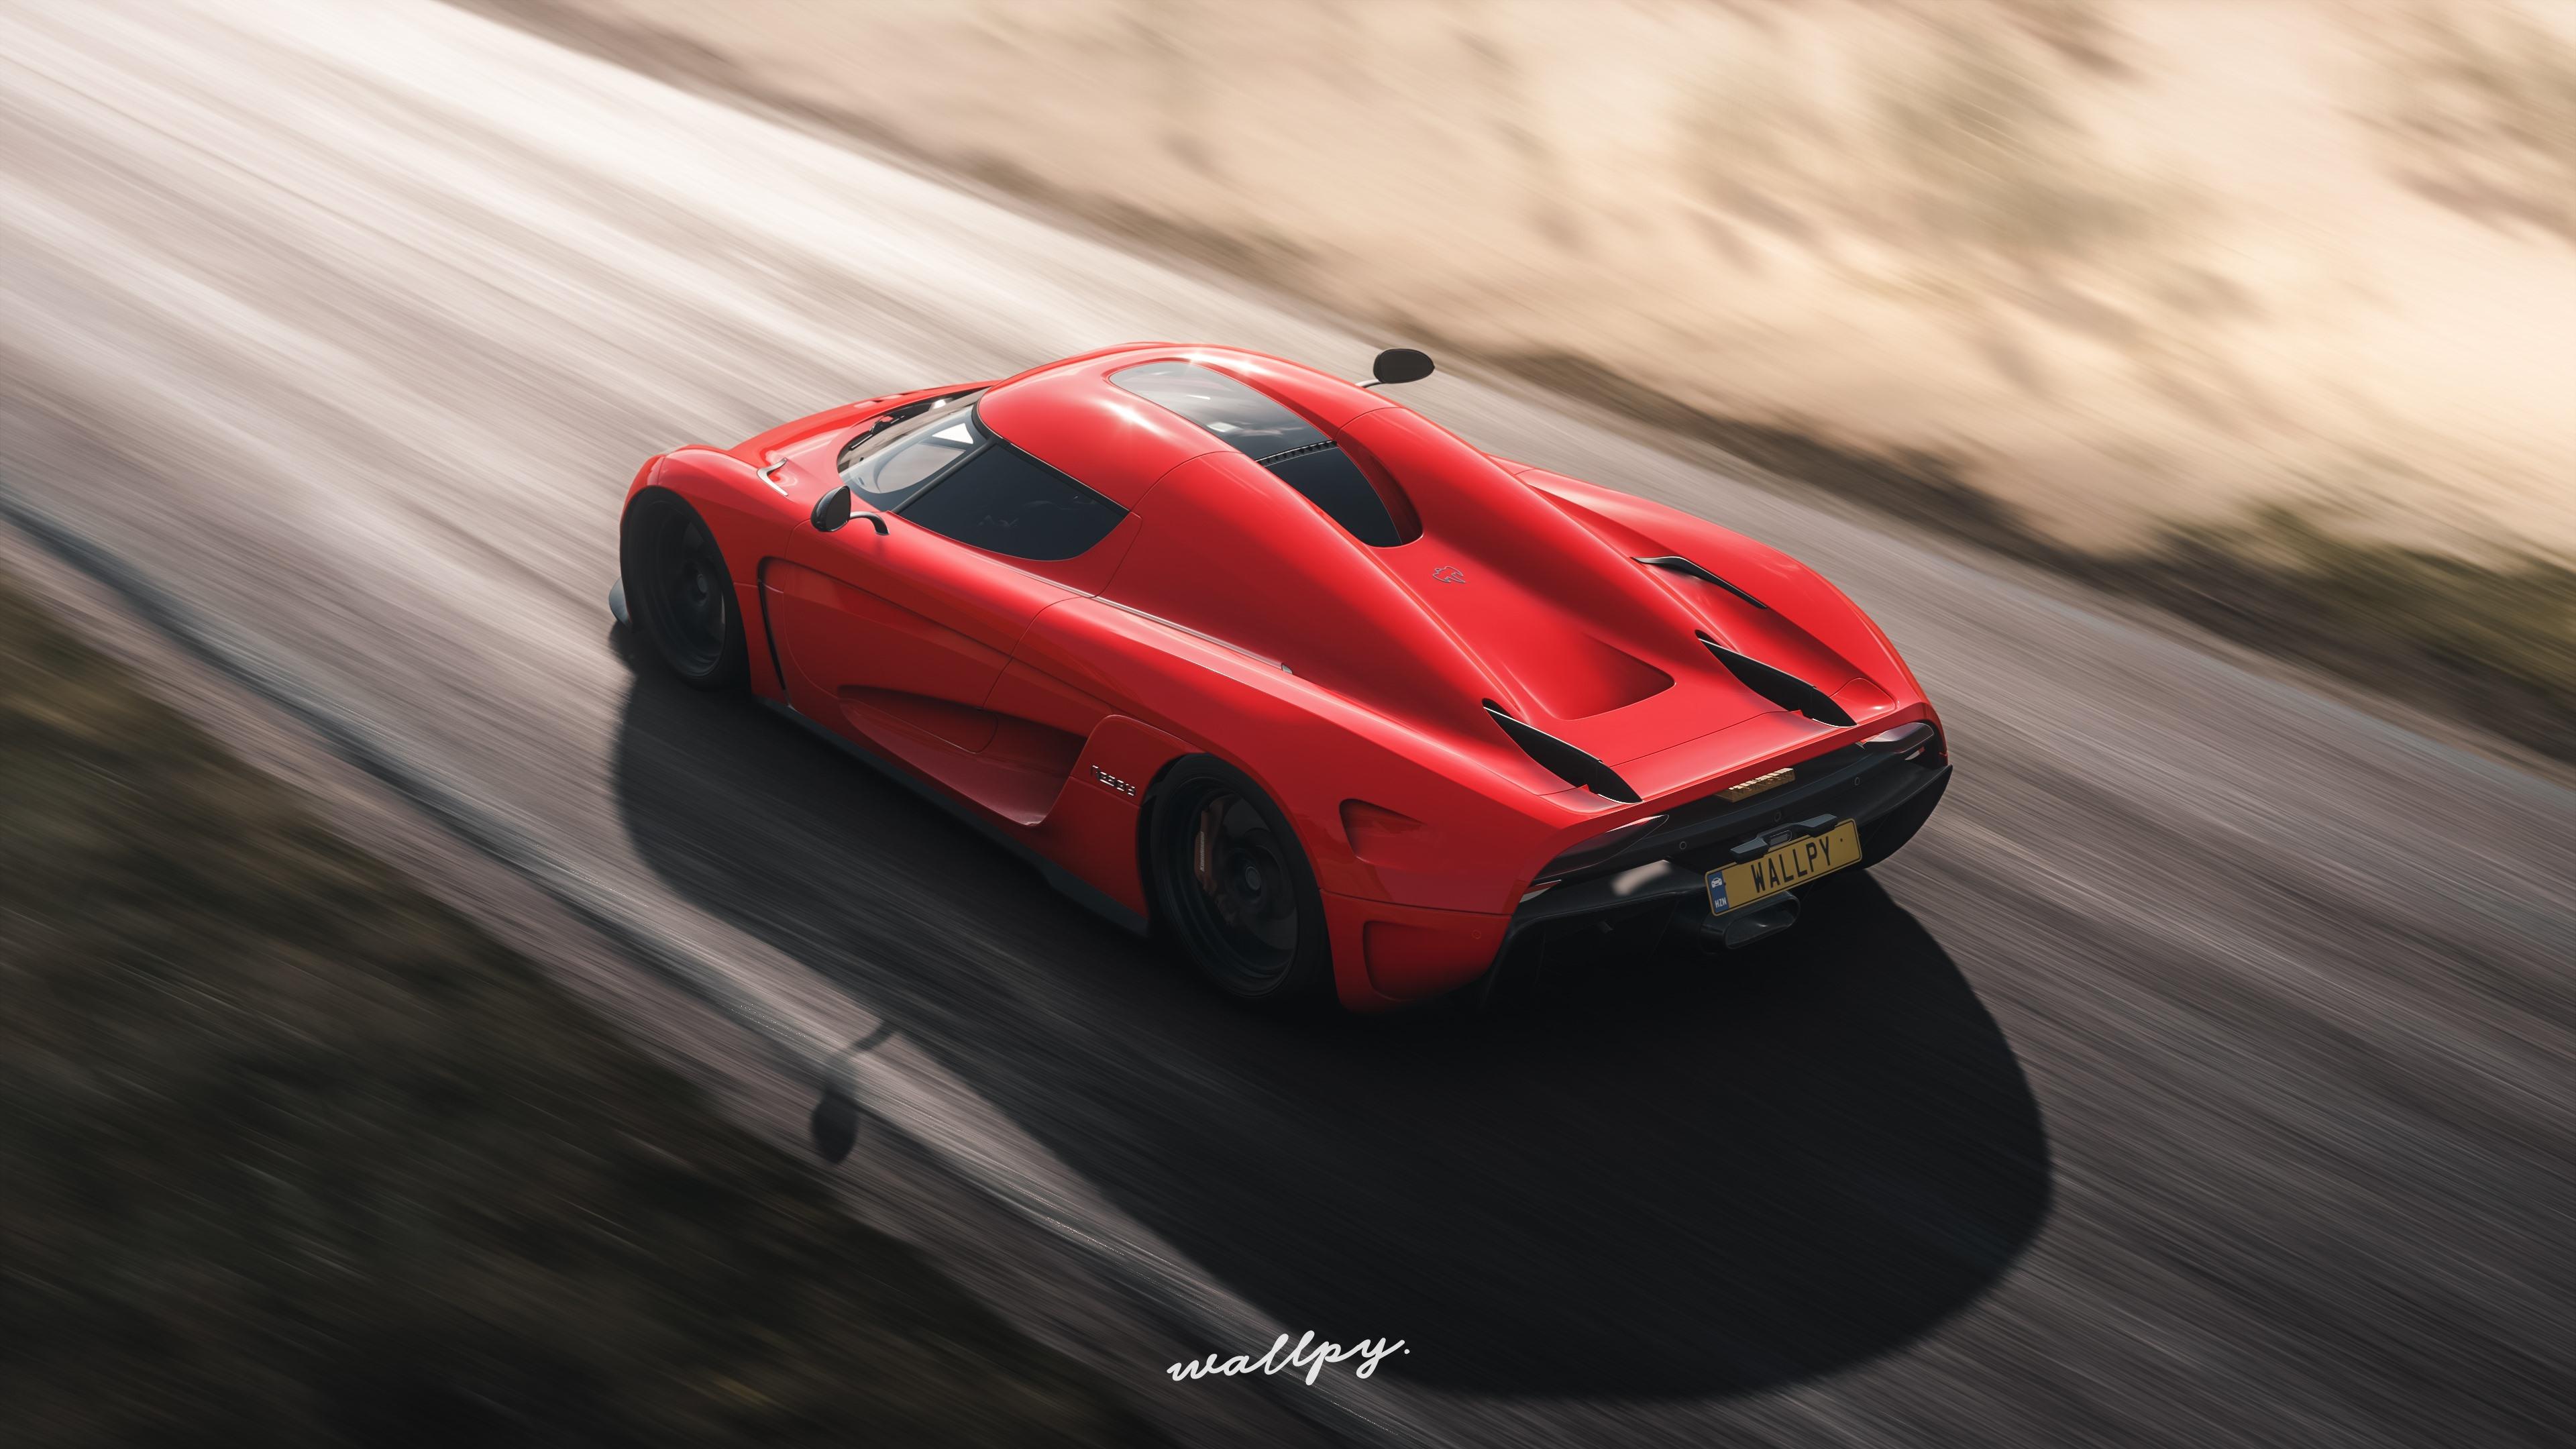 Wallpaper Forza Horizon 4 Red Koenigsegg Supercar Speed